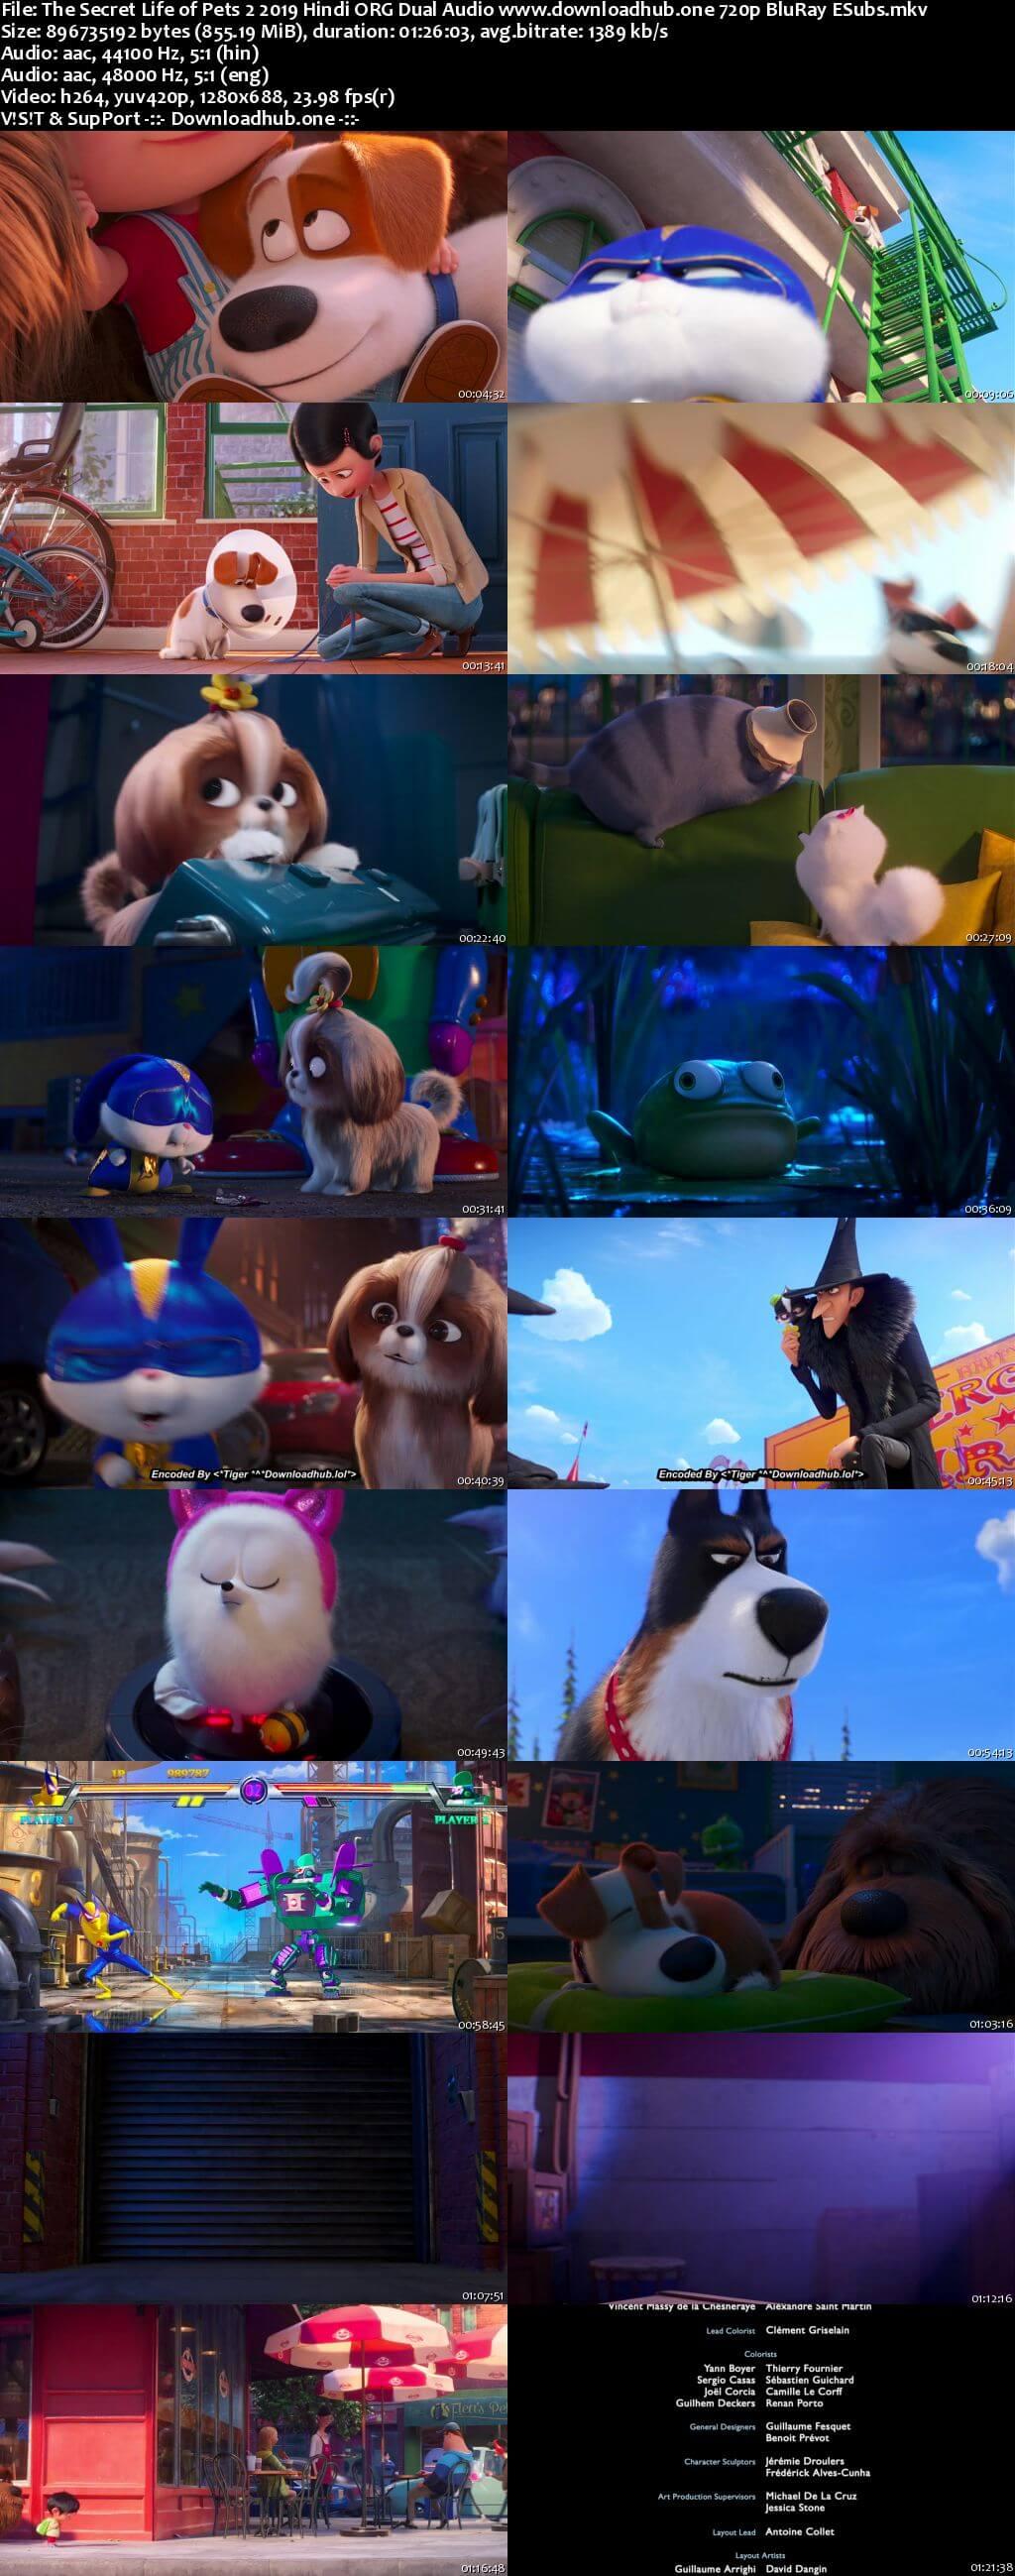 The Secret Life of Pets 2 2019 Hindi ORG Dual Audio 720p BluRay ESubs